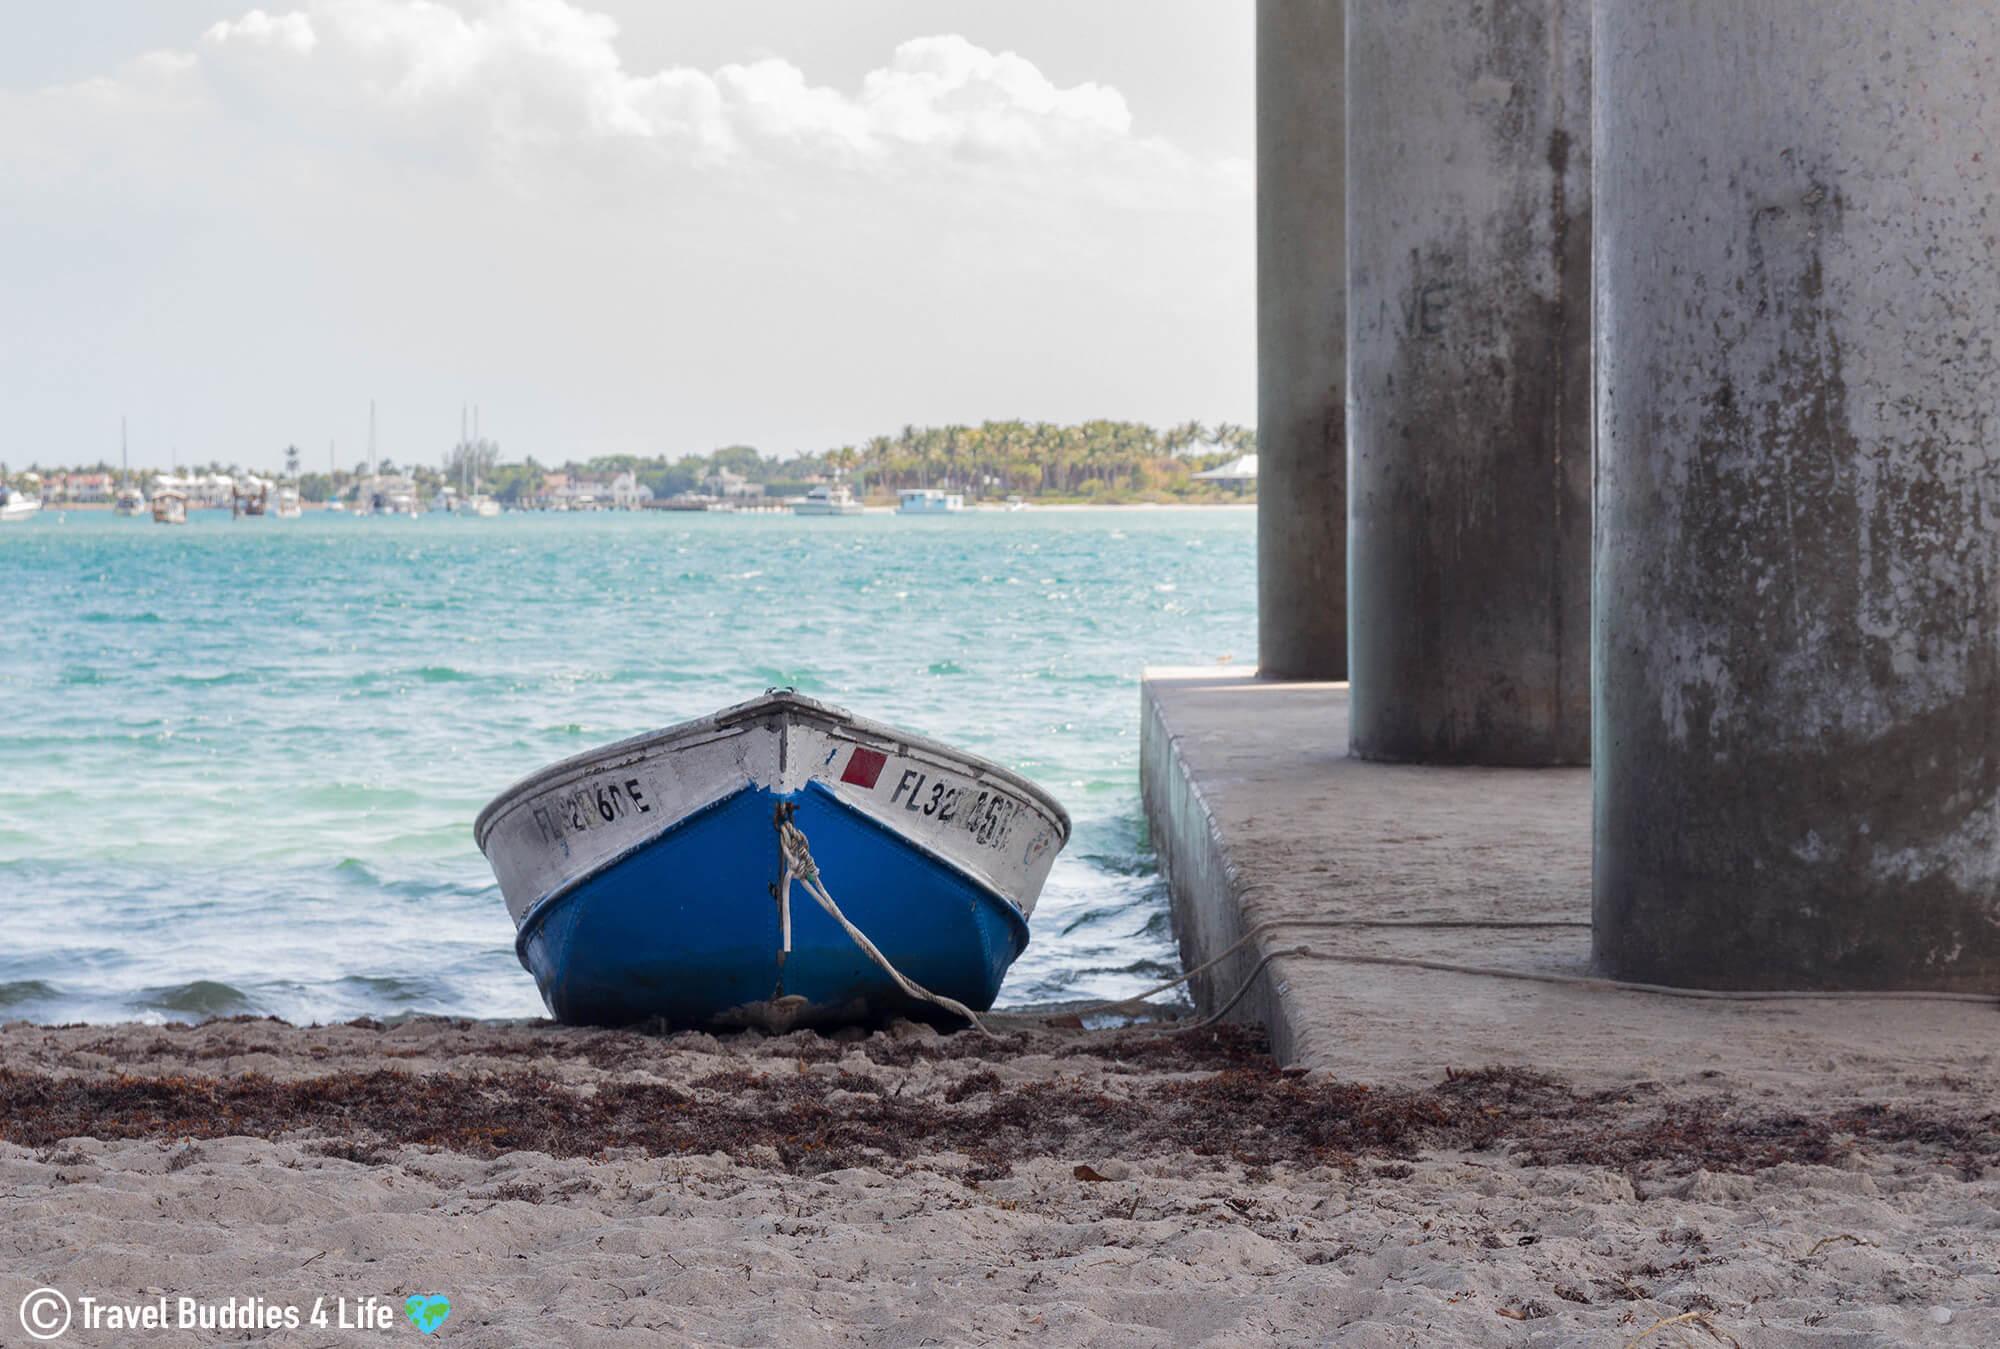 Small Boat On The Beach At Blue Heron Bridge, West Palm Beach